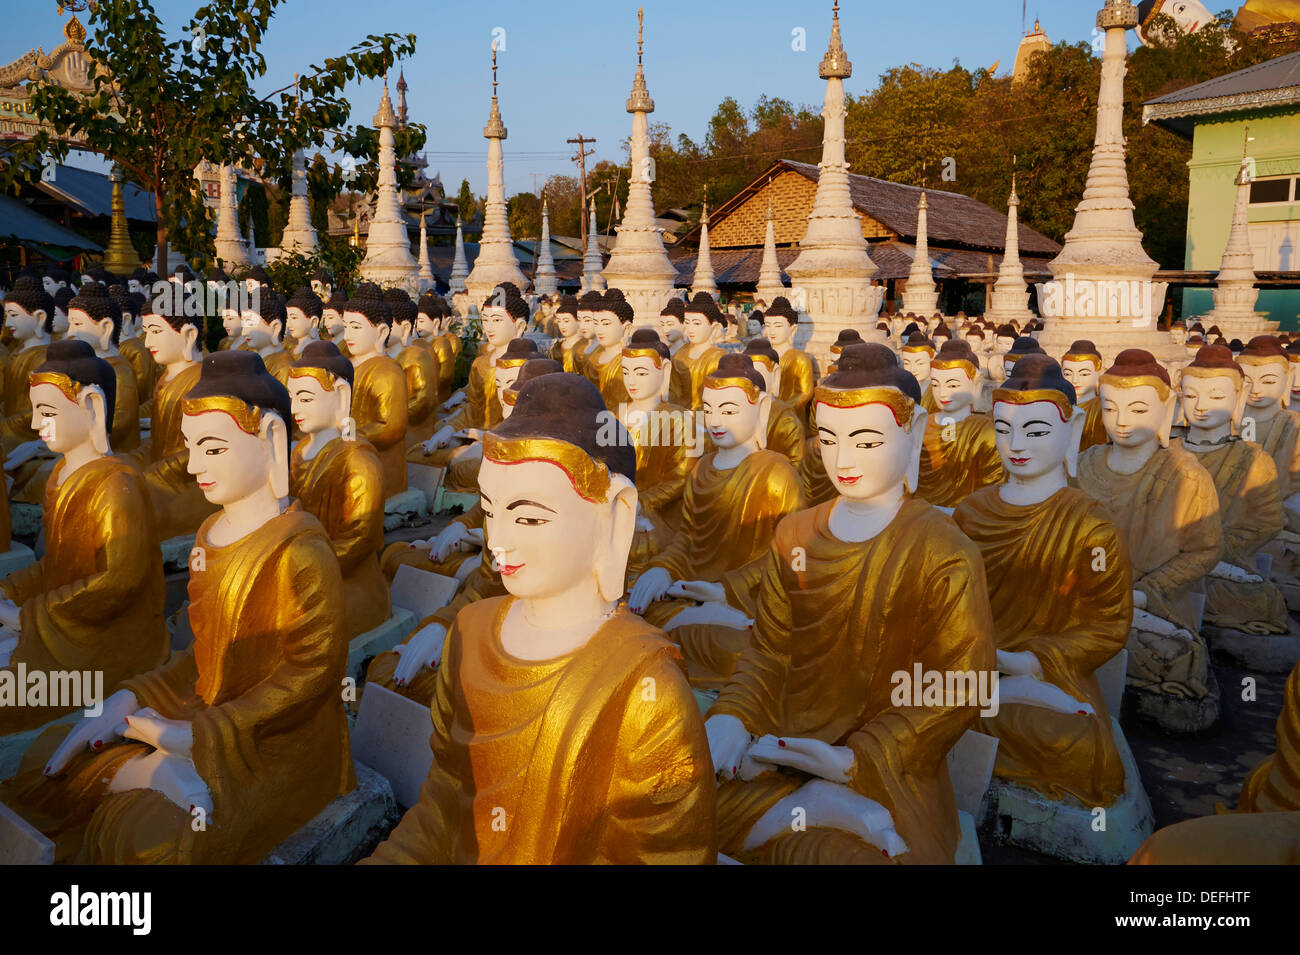 Bodhi Tataung, Monywa, Sagaing Division, Myanmar (Burma), Asia - Stock Image